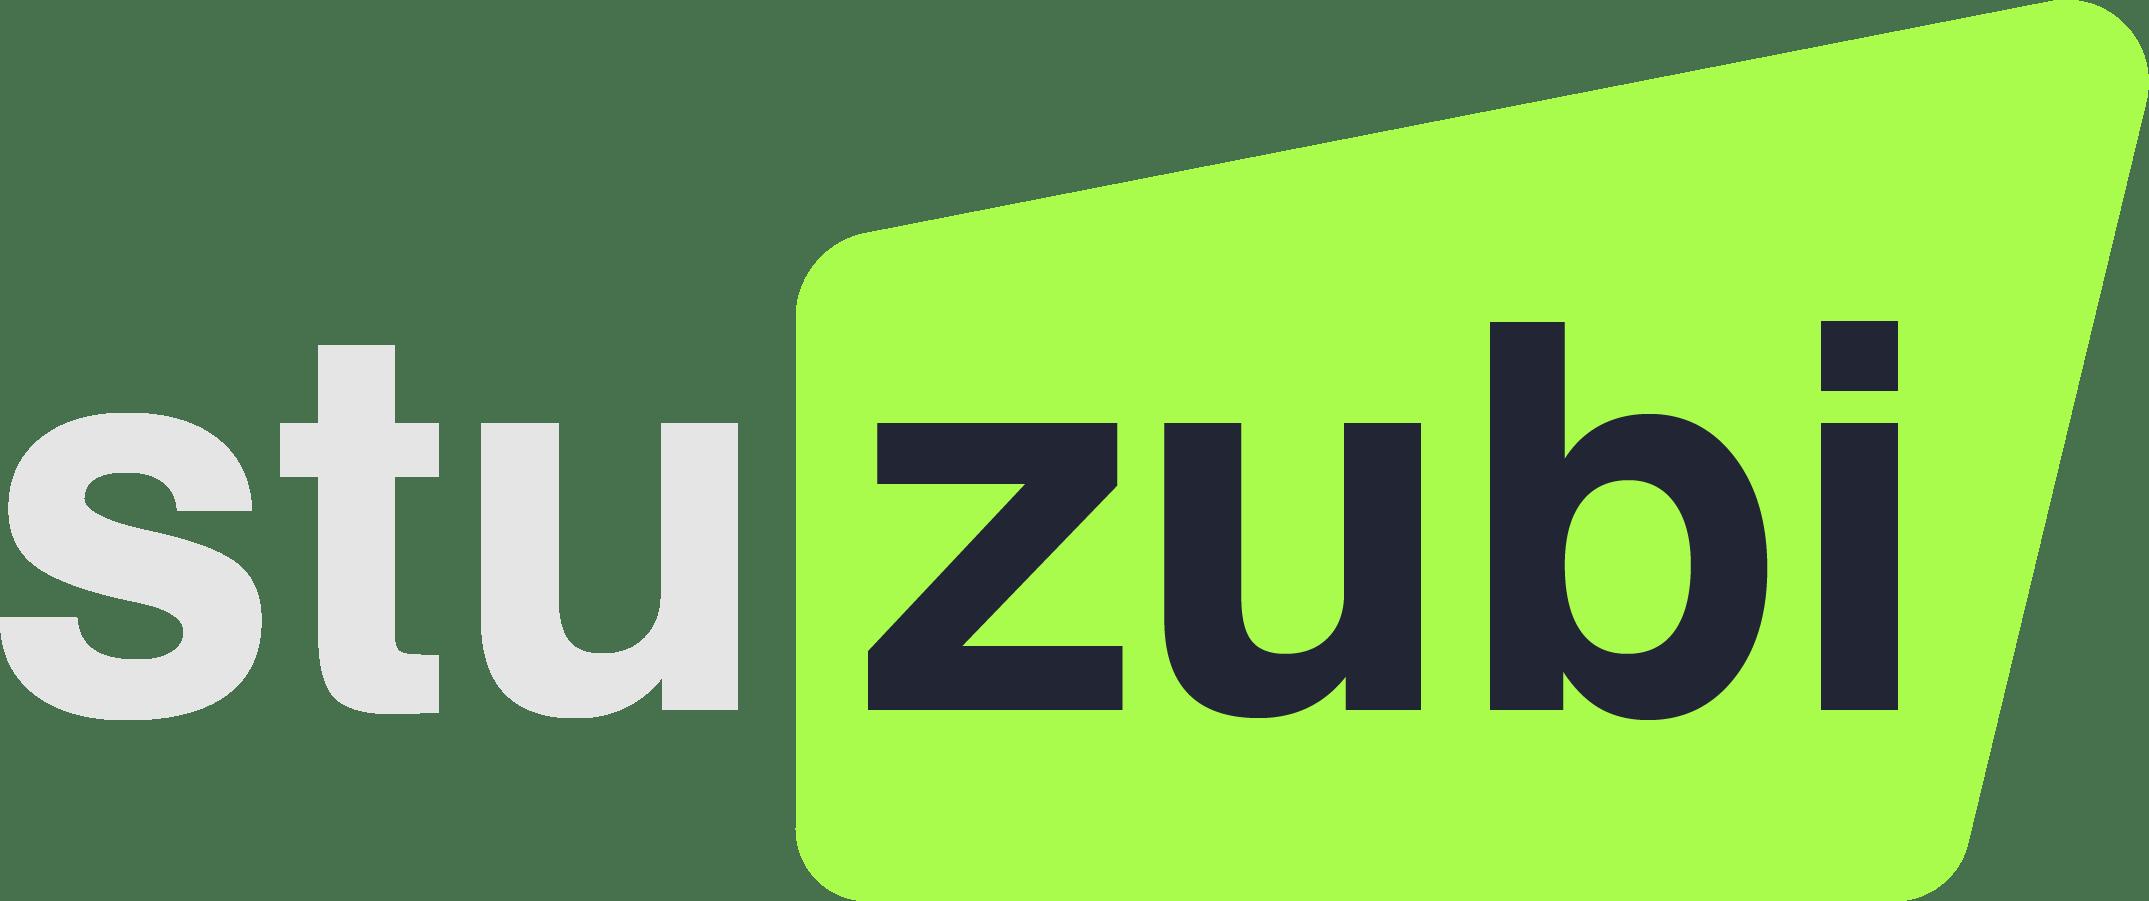 logo-stuzubi